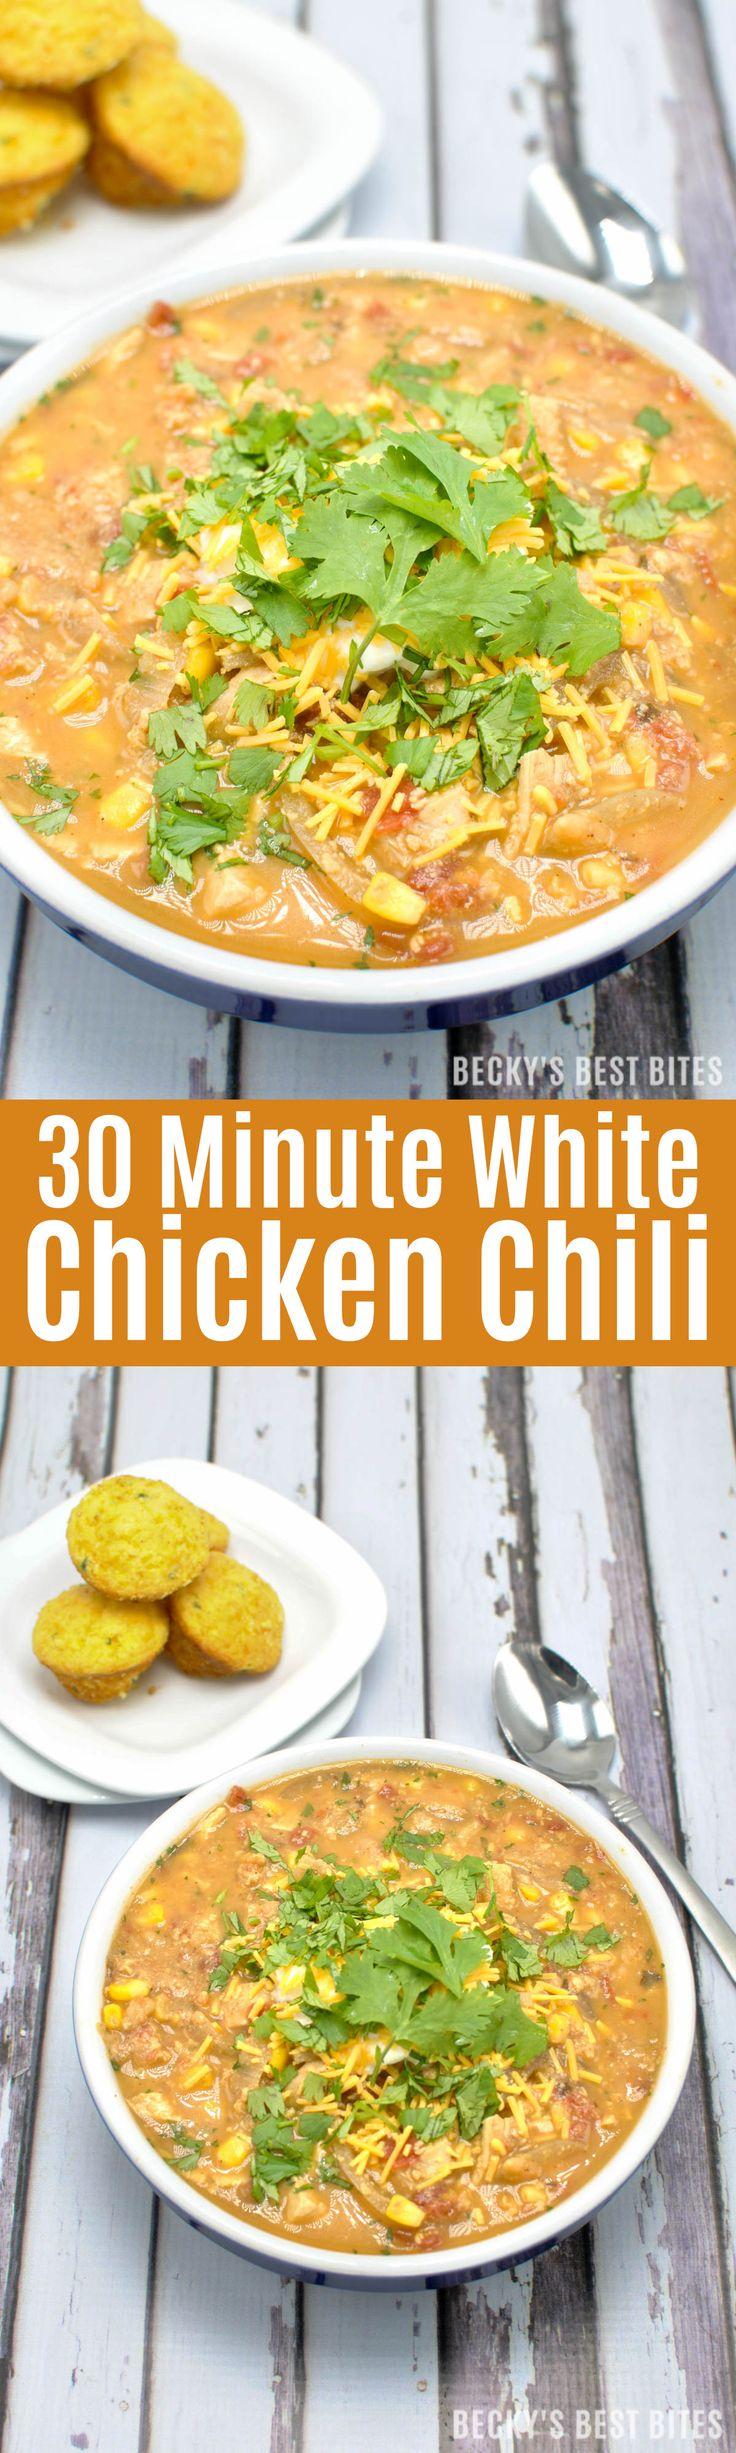 30 Minute White Chicken Chili. It's so easy to make! | White chicken ...